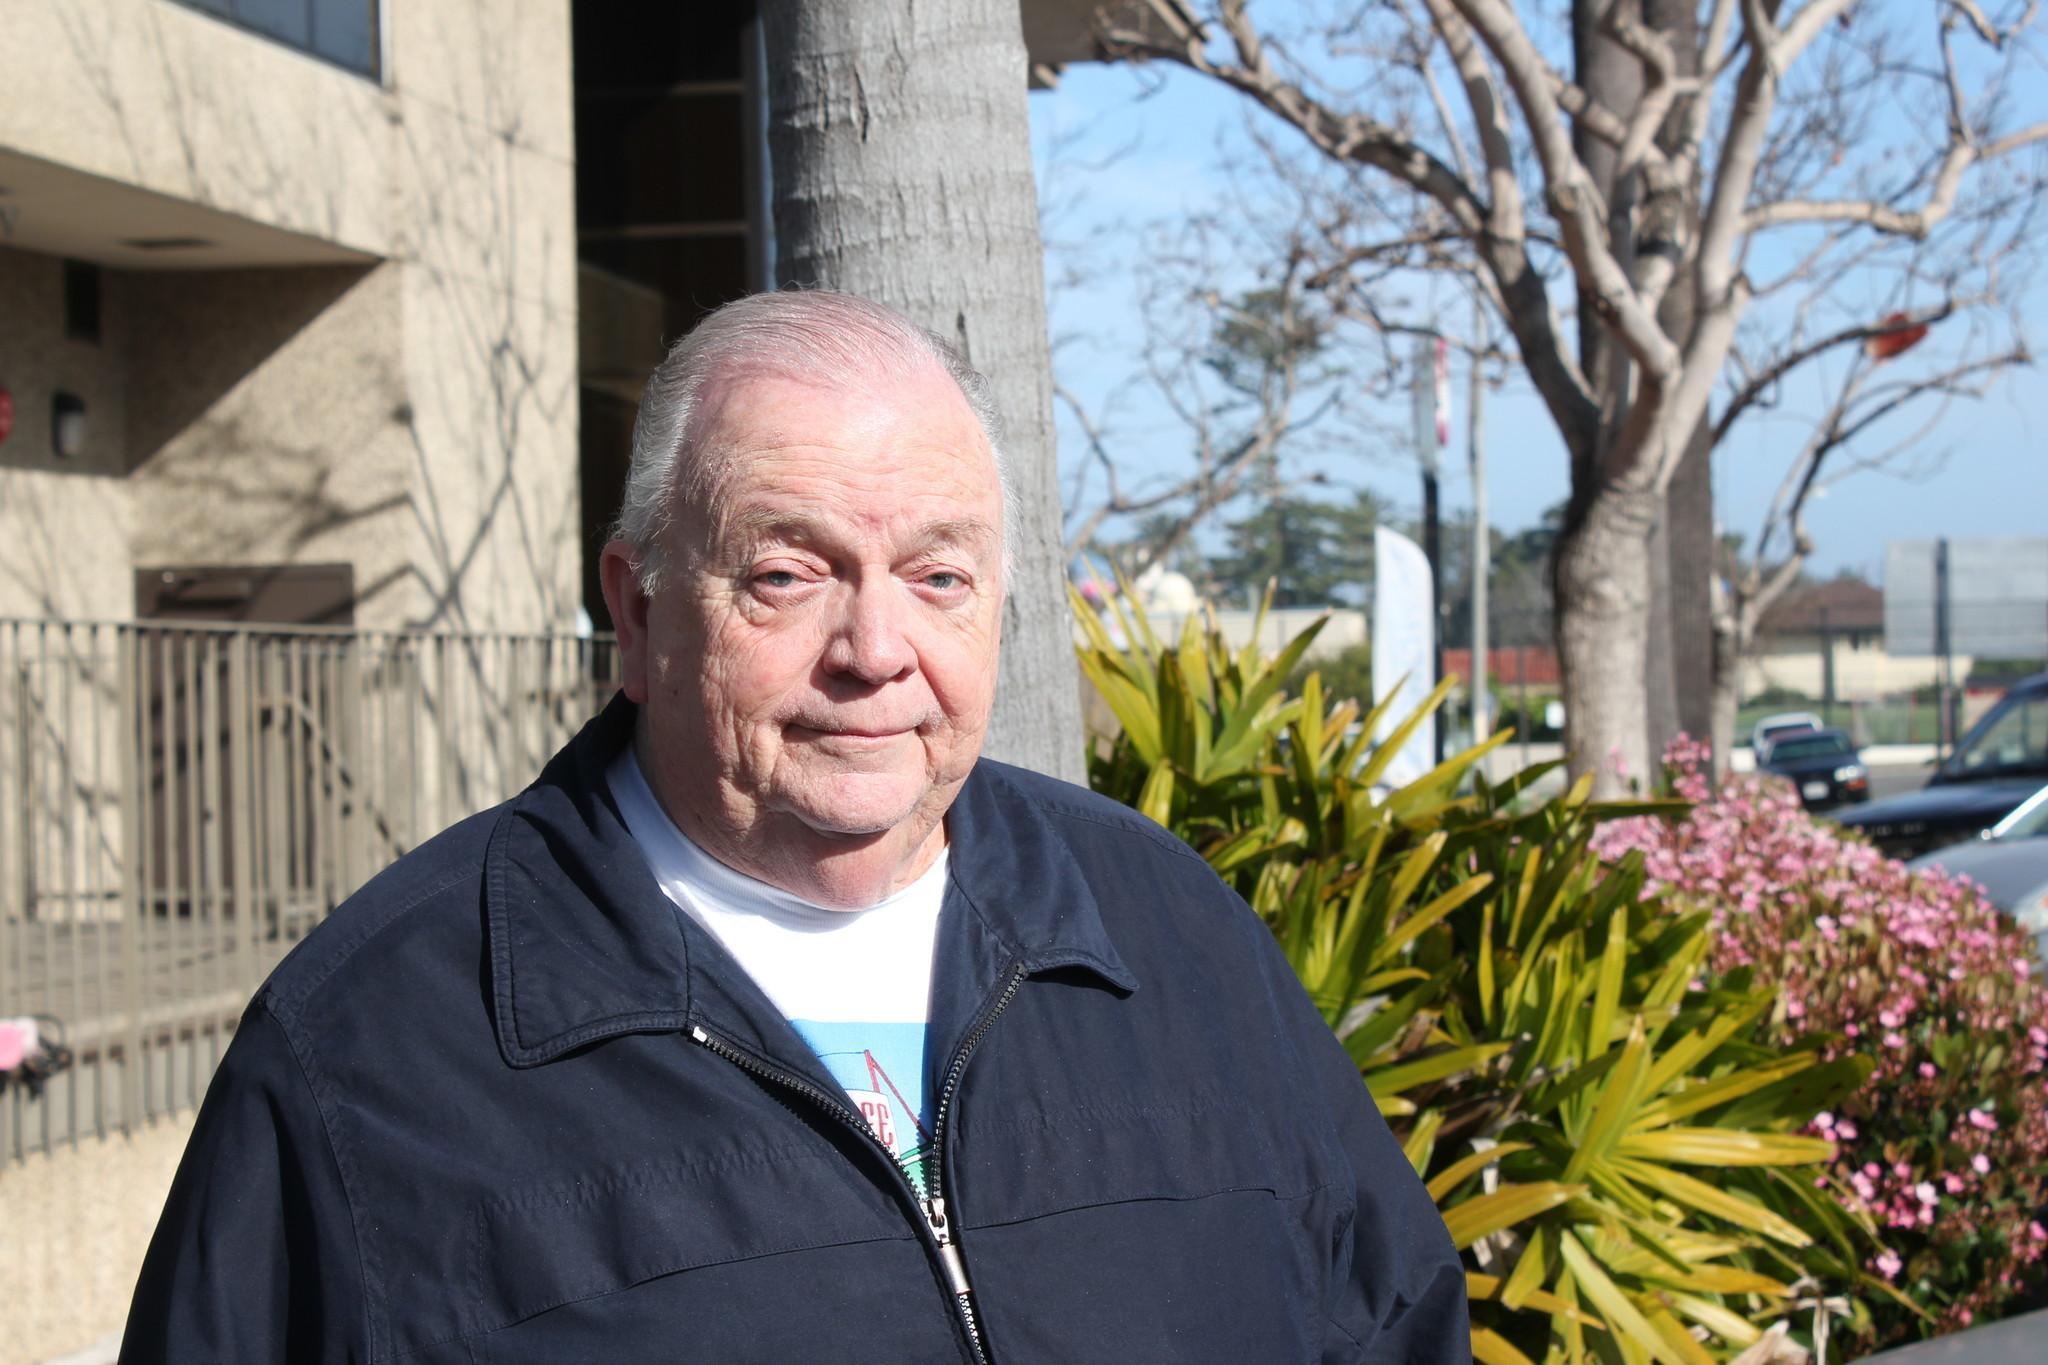 People In Your La Jolla Neighborhood Meet Retired Village Of La